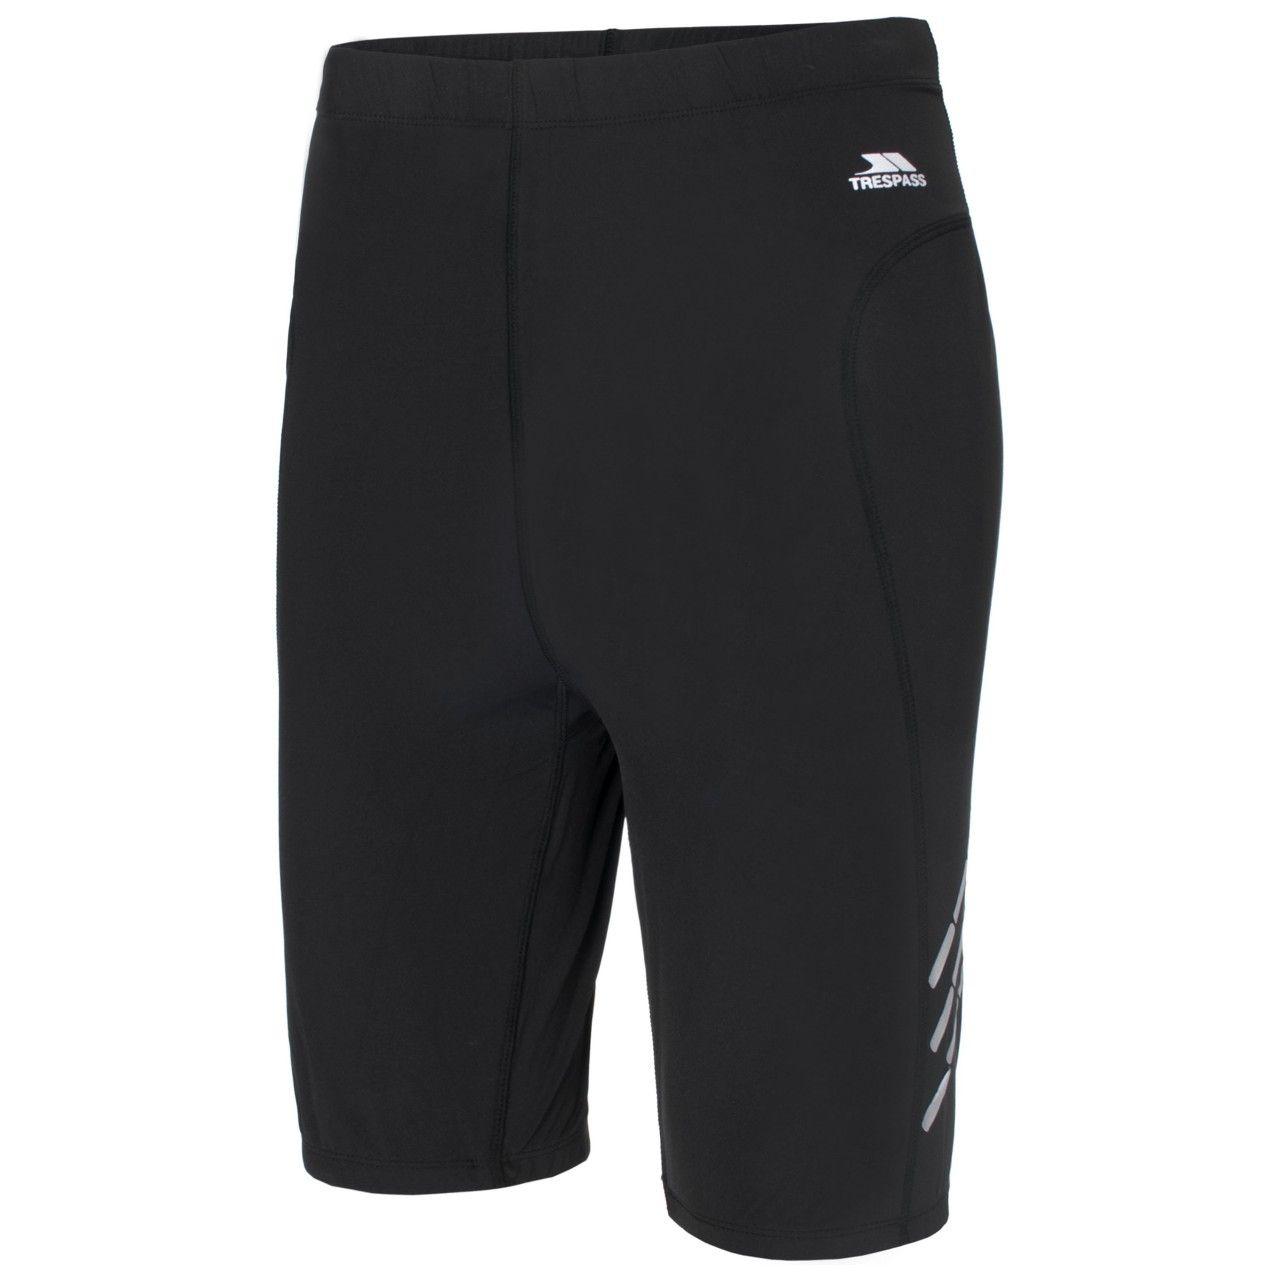 Trespass Mens Crawl Athletic Sport Base Layer Shorts